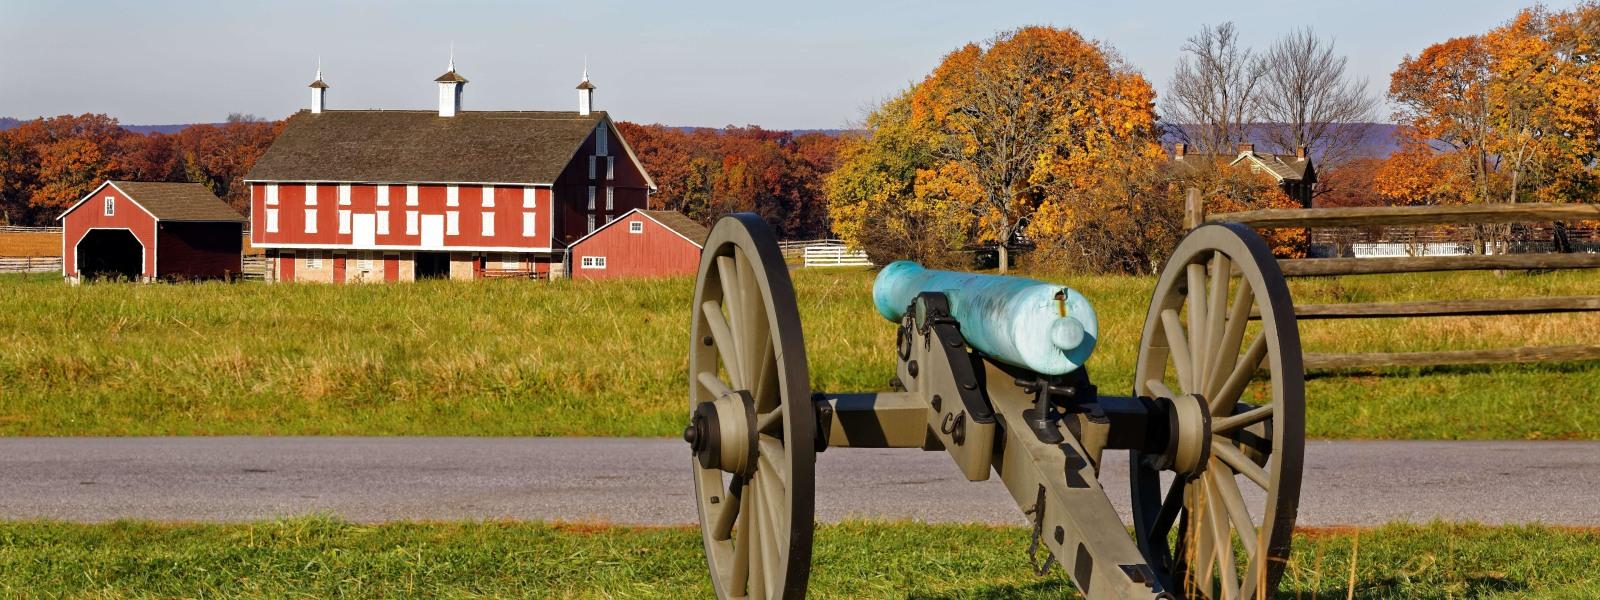 GettysburgBattlefield-Tour-Guide